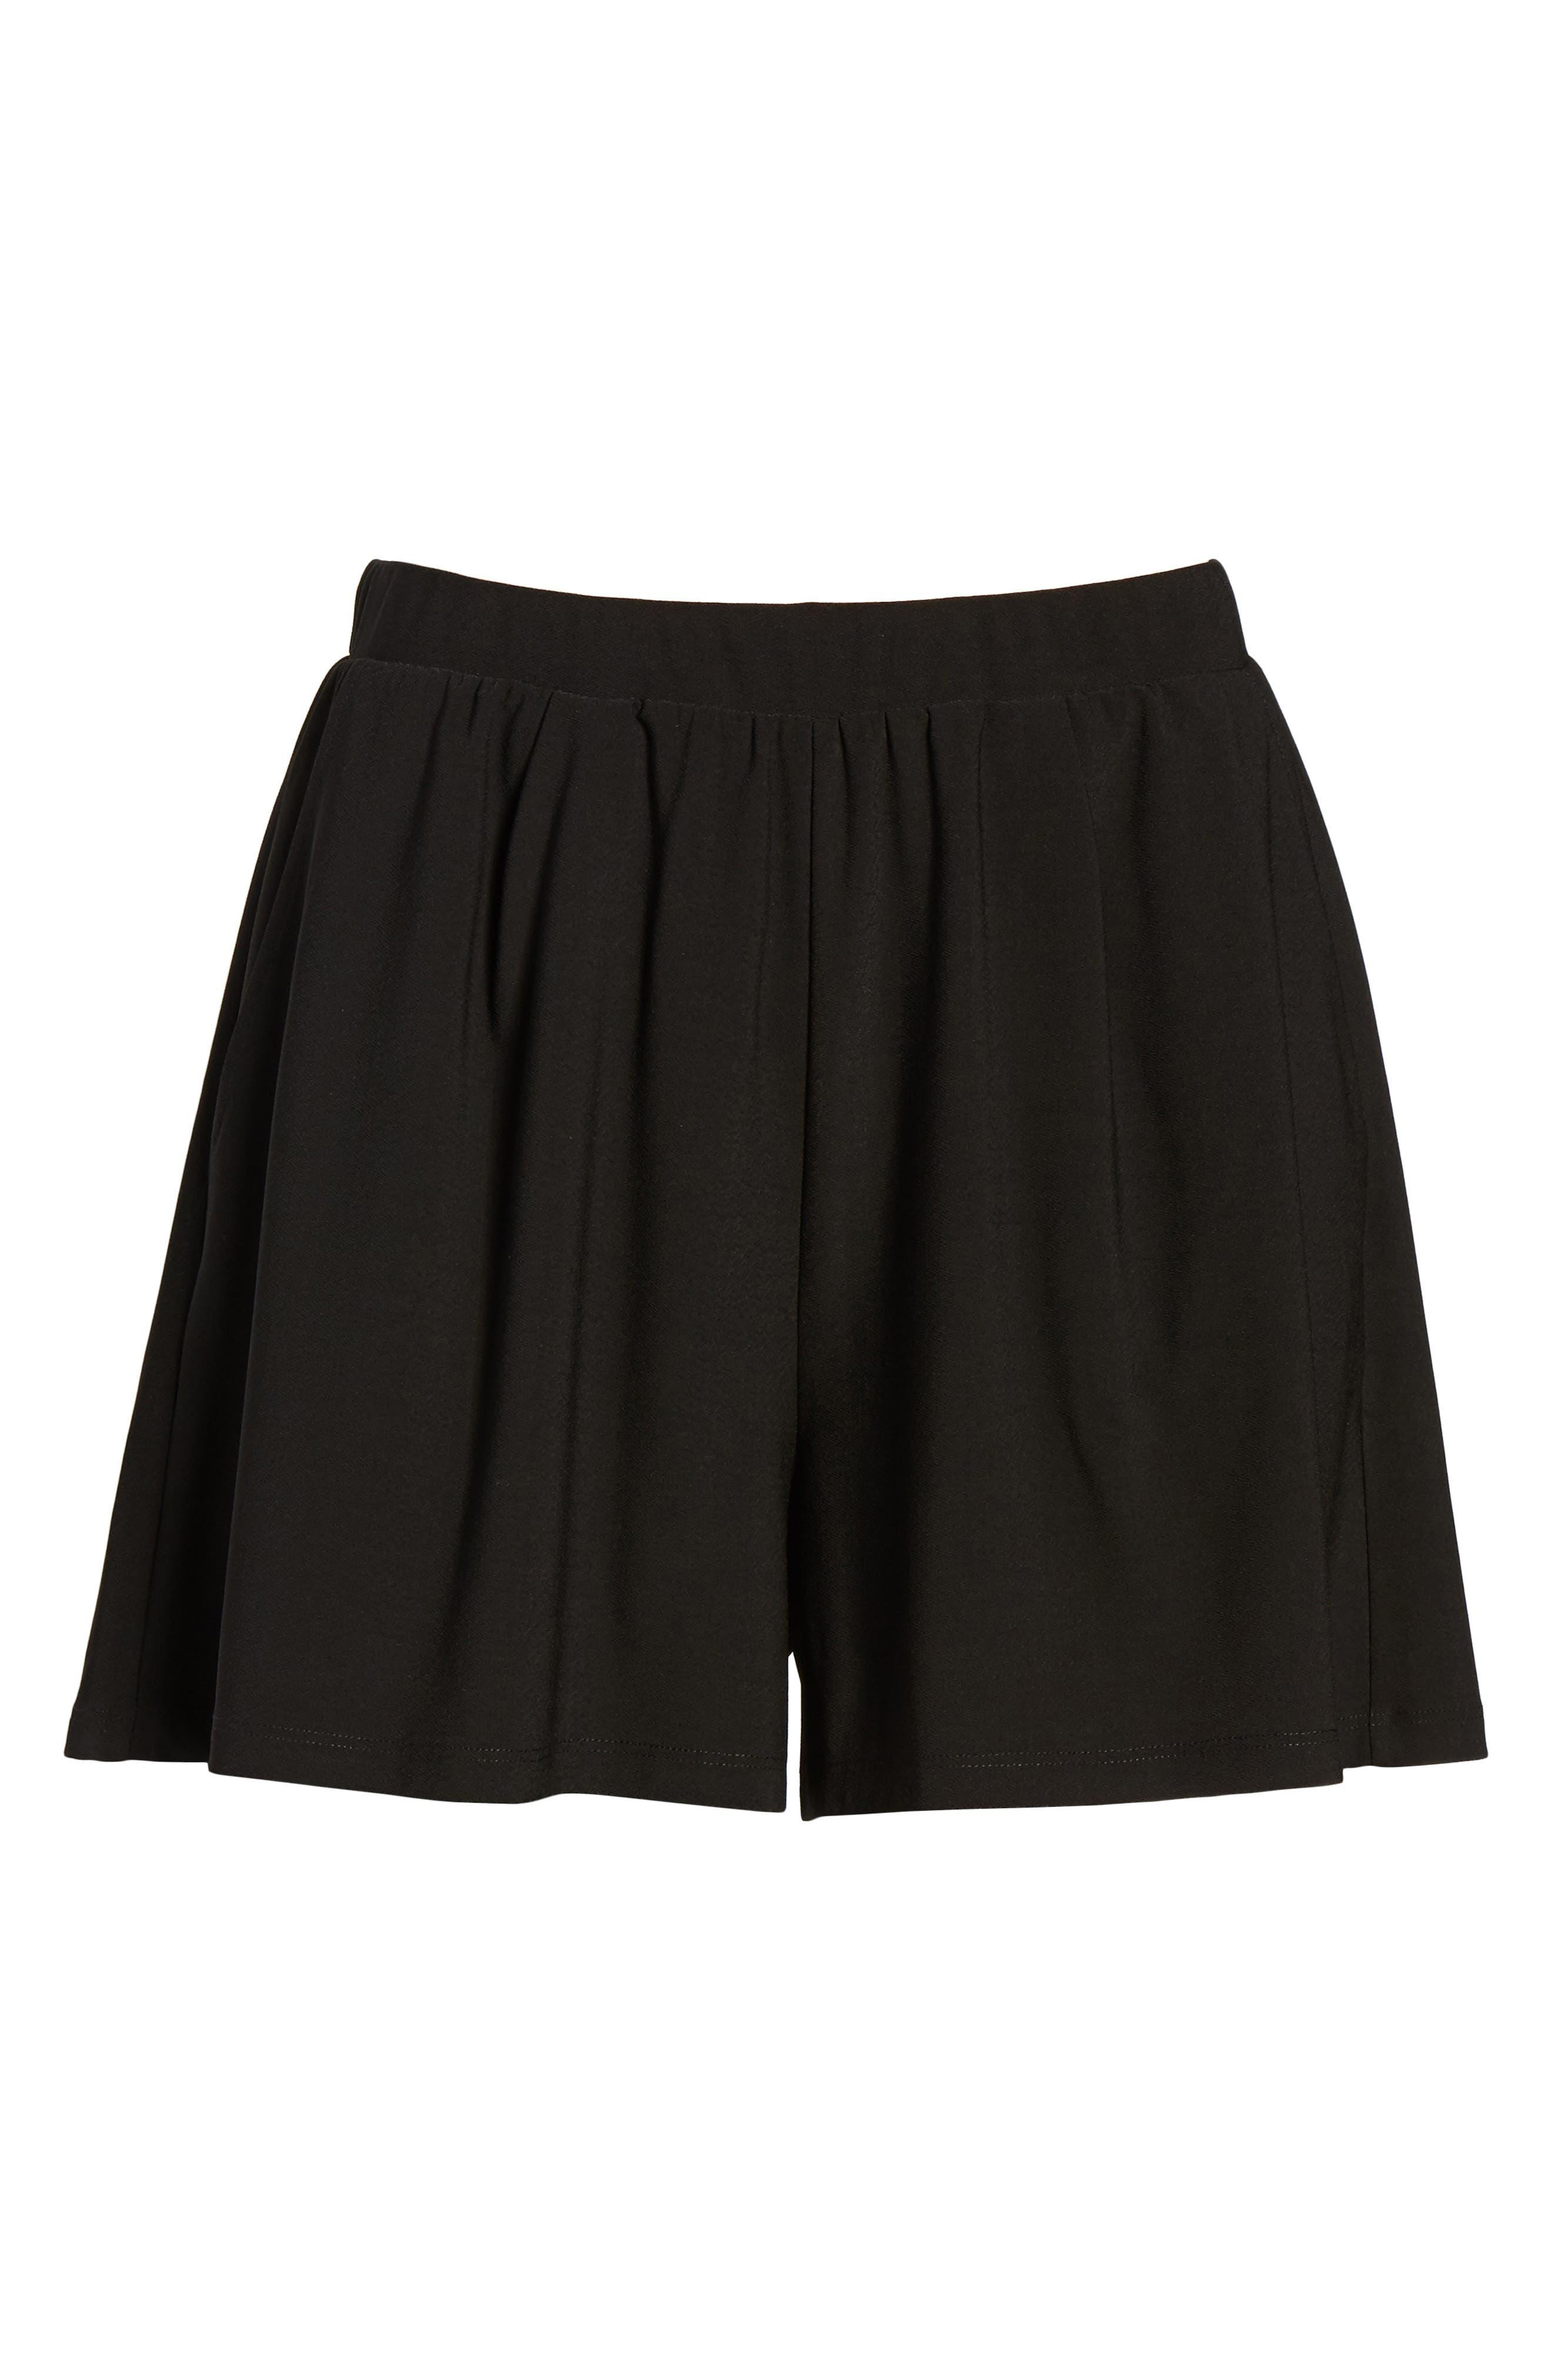 Pleat Front Shorts,                             Alternate thumbnail 6, color,                             001